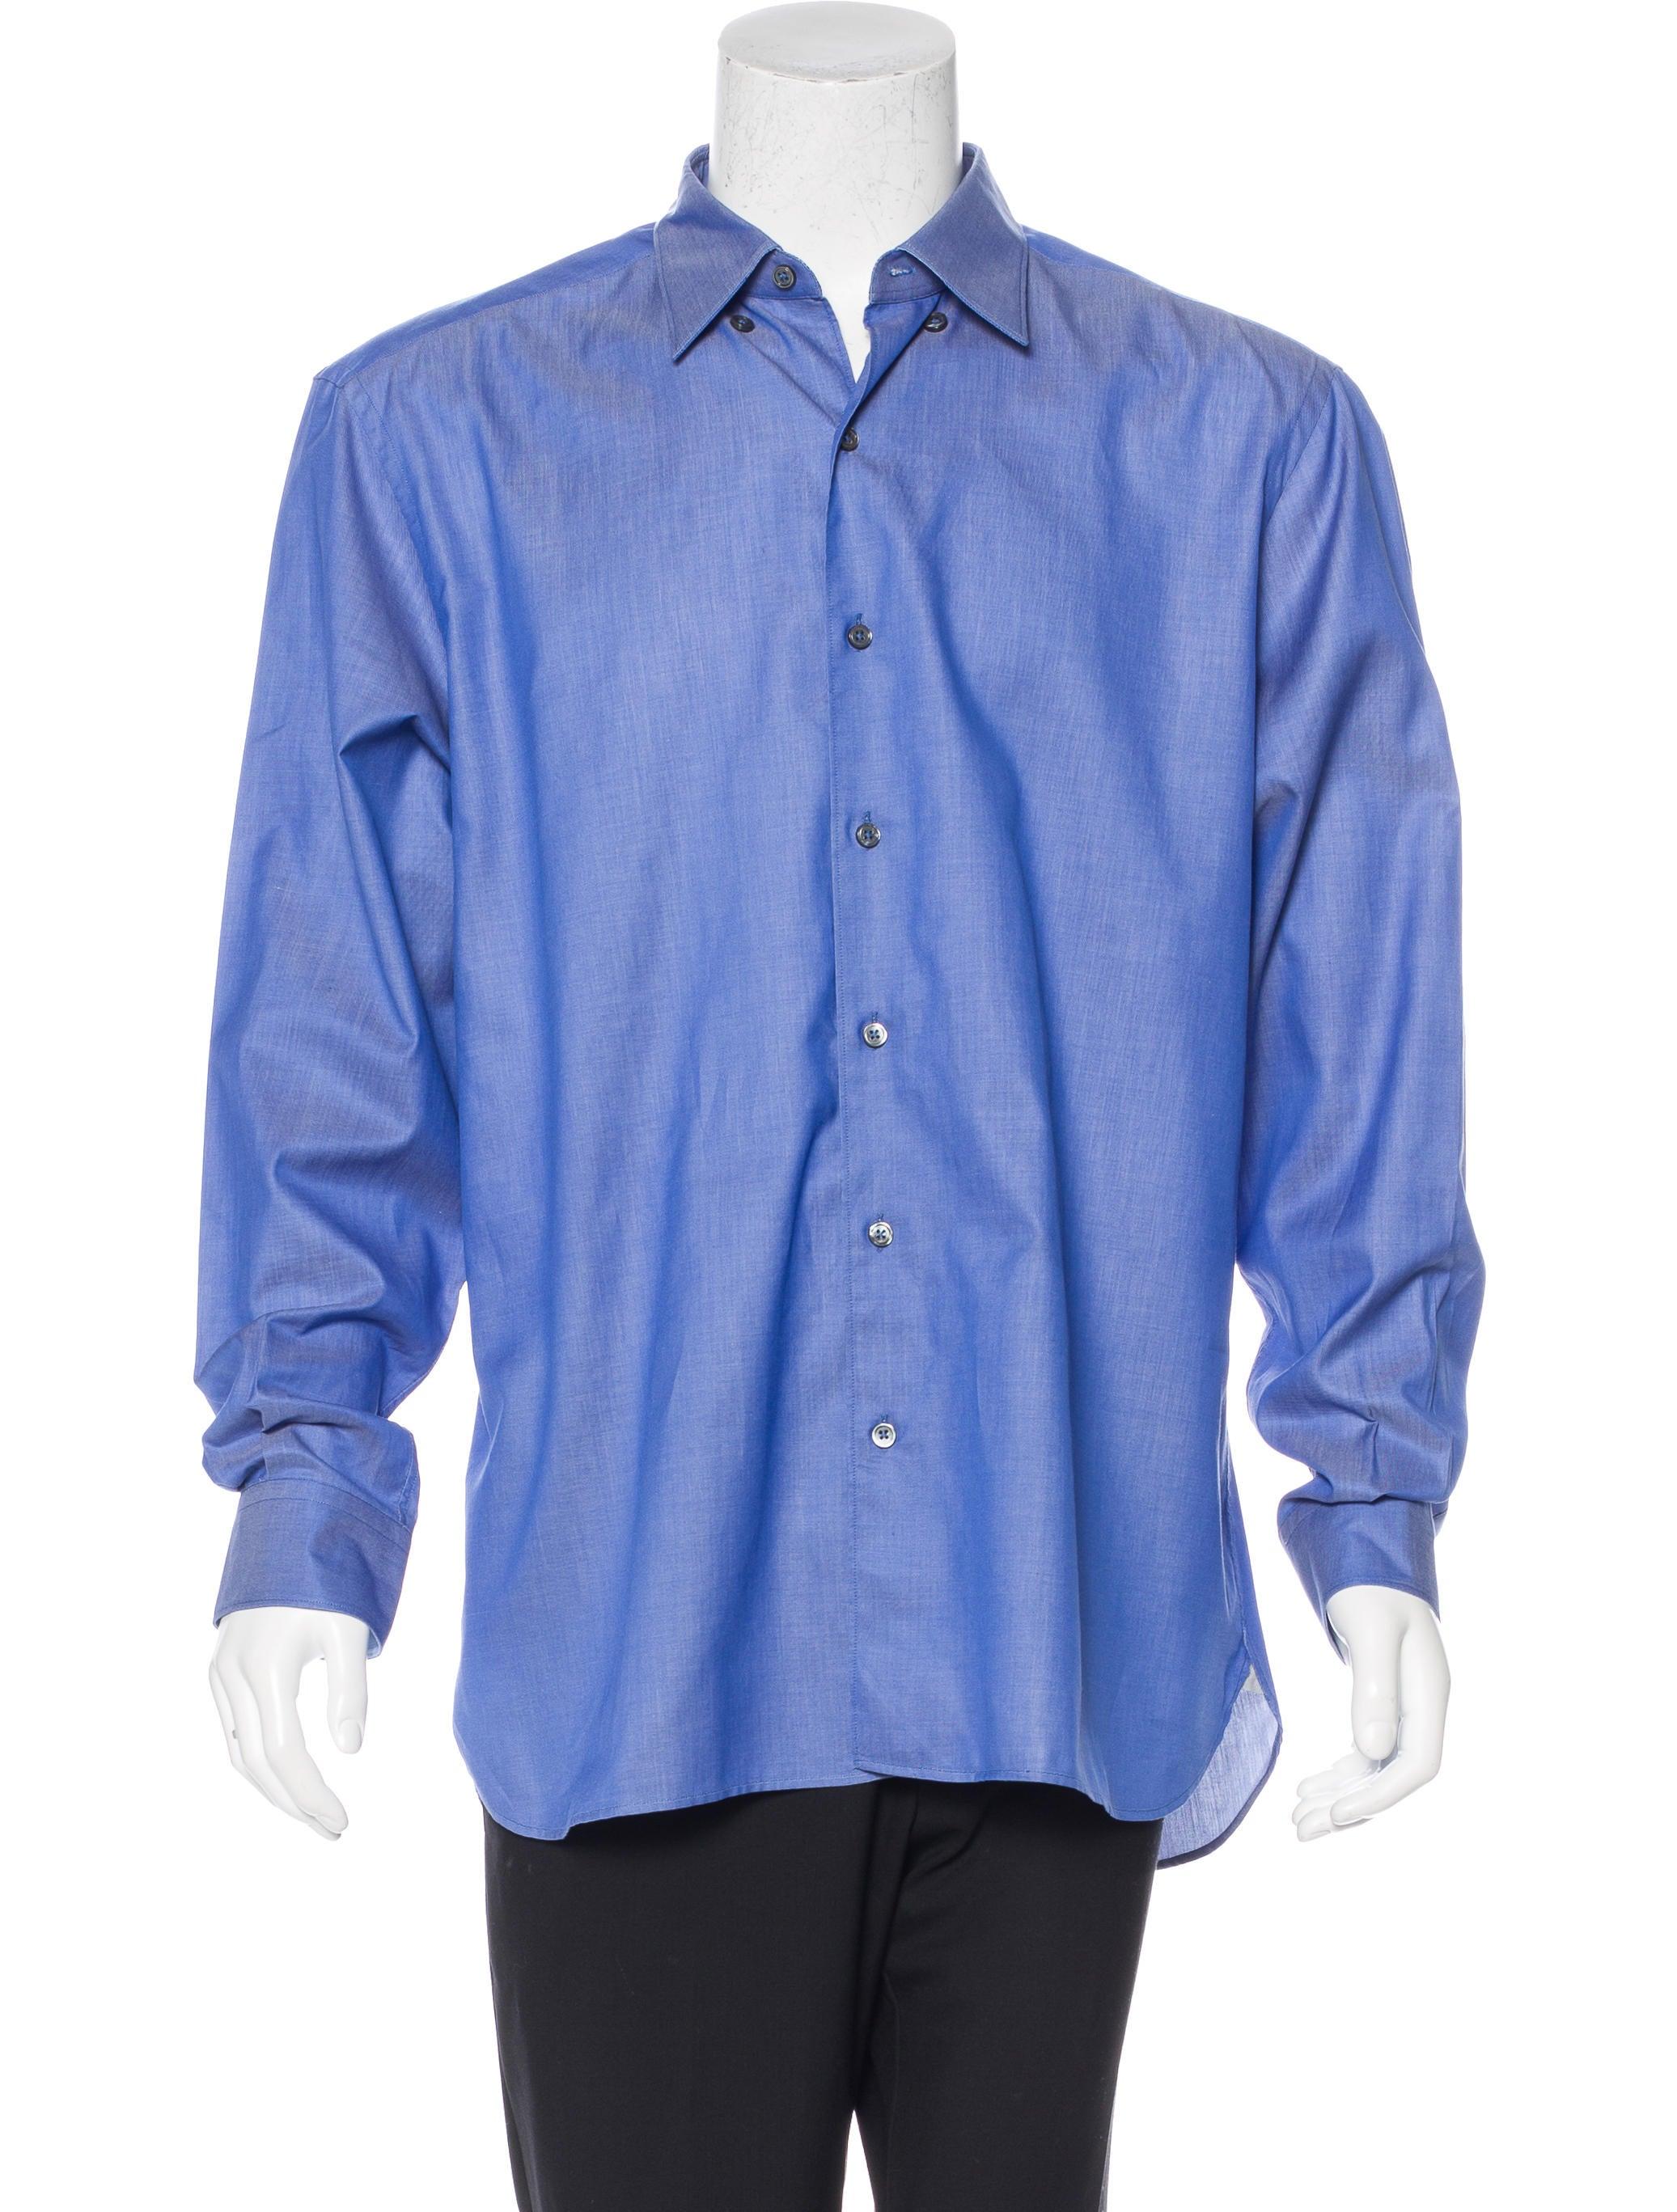 ermenegildo zegna woven button up shirt clothing zgn24622 the realreal. Black Bedroom Furniture Sets. Home Design Ideas